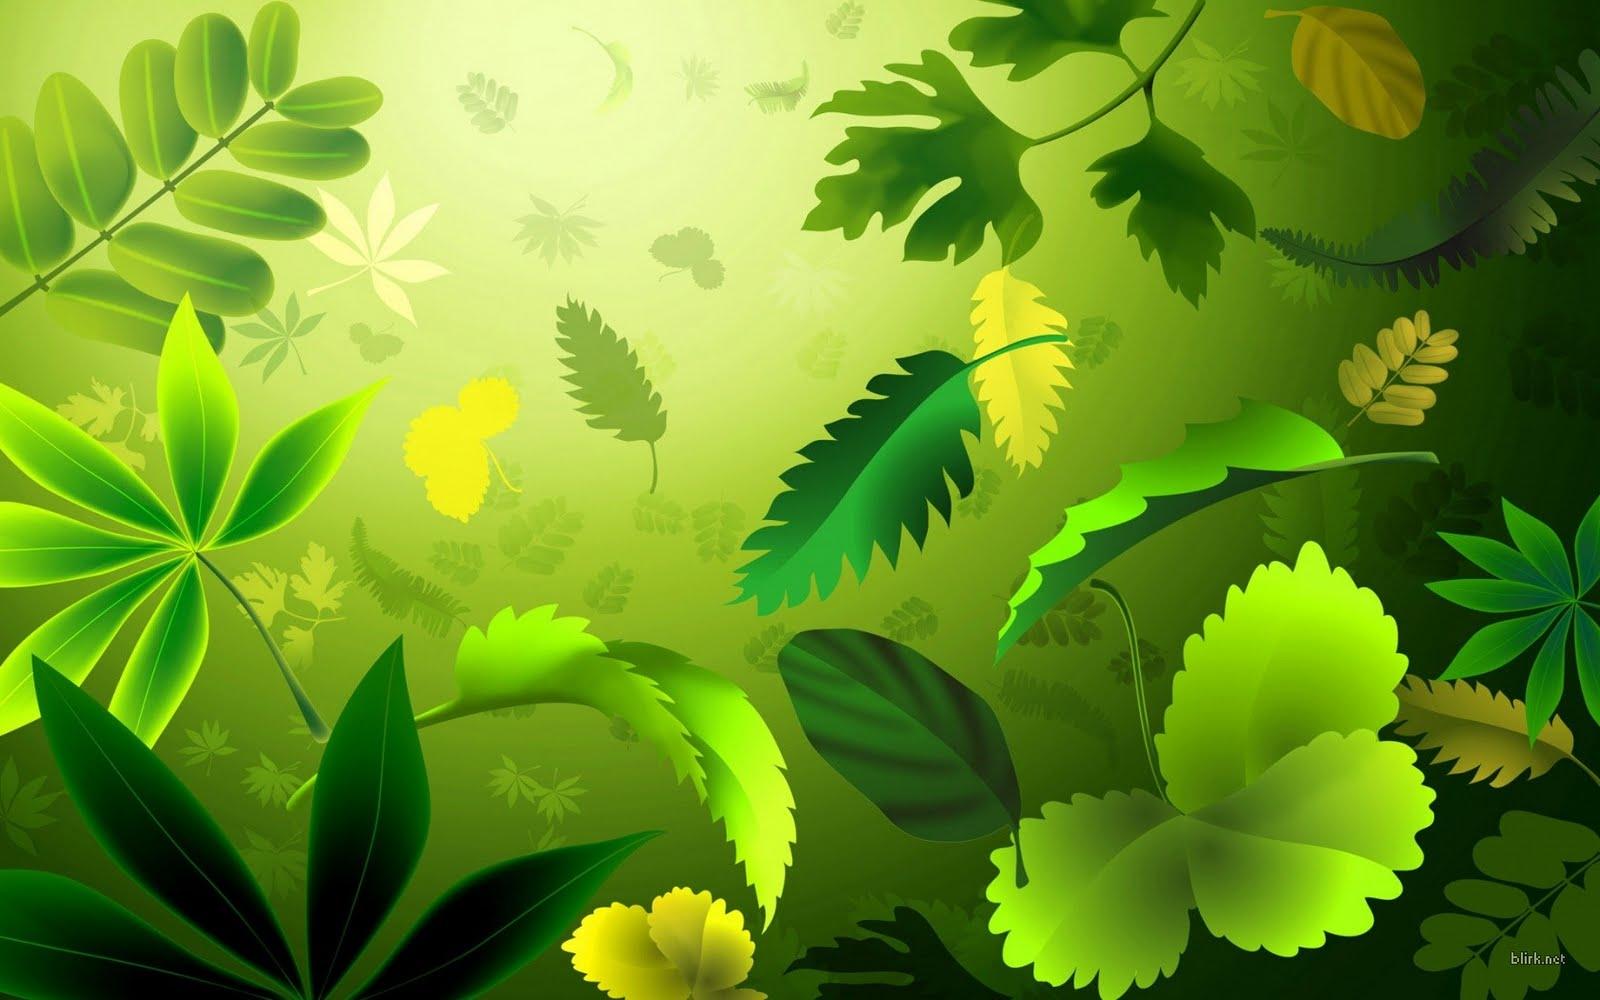 http://1.bp.blogspot.com/_YA8CmyMTHA0/TBQAu5_3bFI/AAAAAAAAAgw/qz_McVZmGU8/s1600/green-leafs-001.jpg